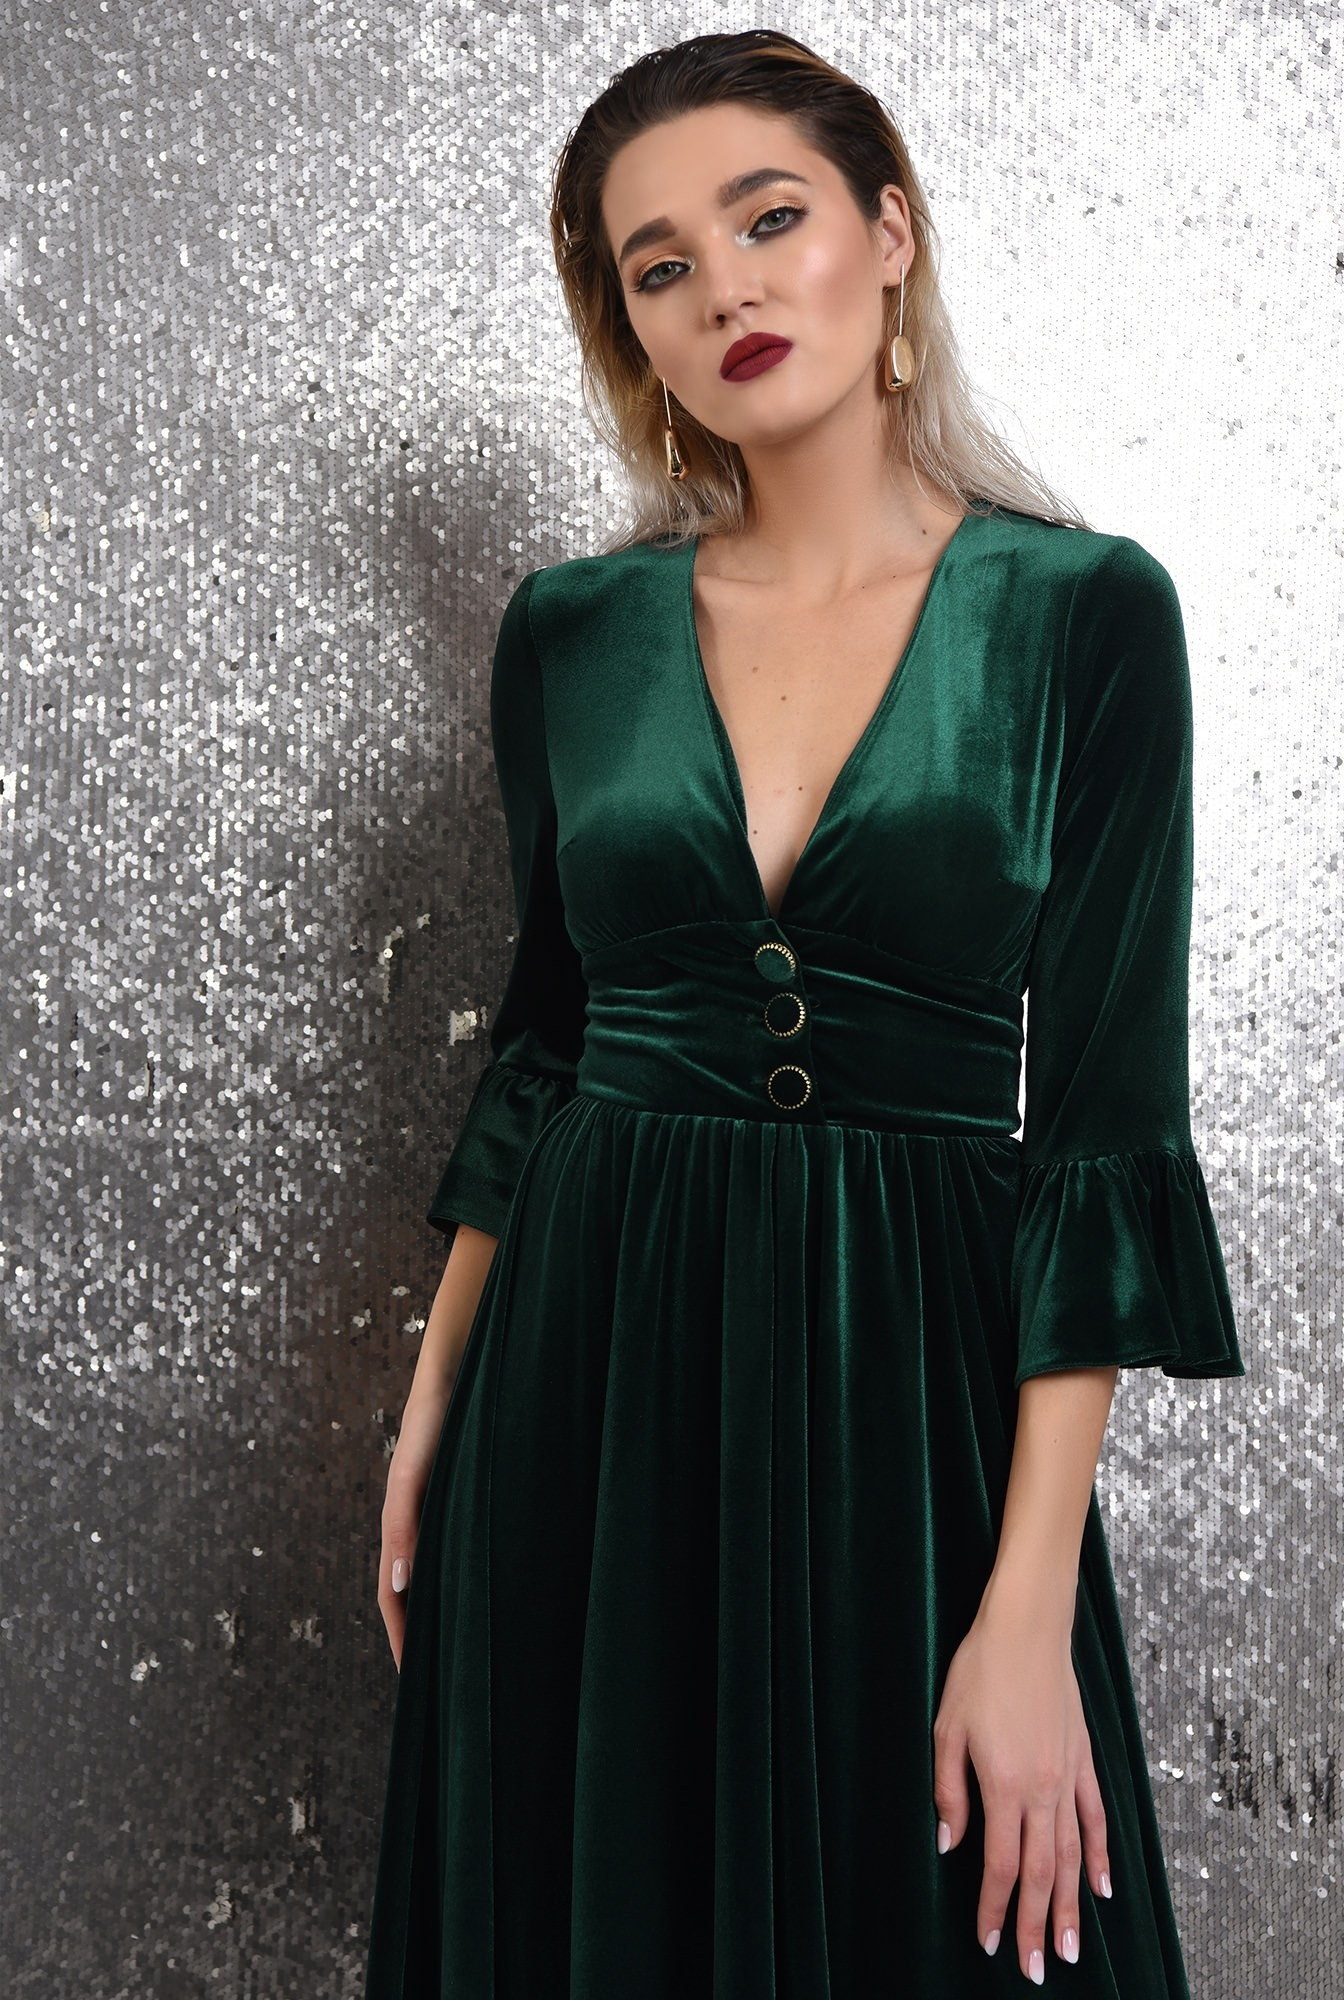 2 -  360 - rochie verde, midi, clos, catifea, maneci peplum, Poema